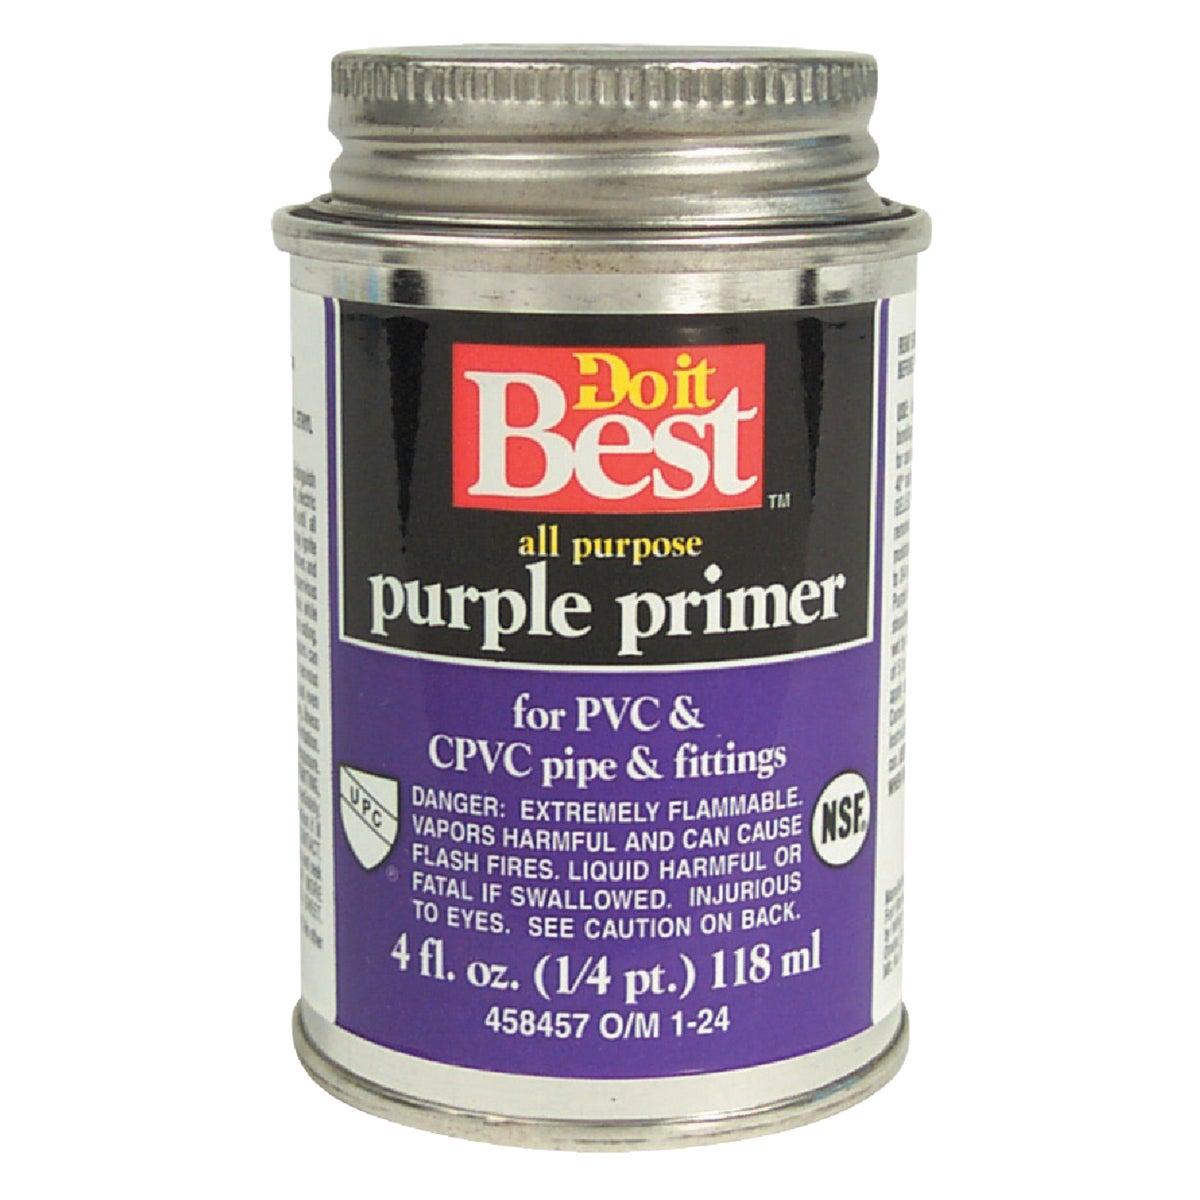 1/4PINT PURPLE PRIMER